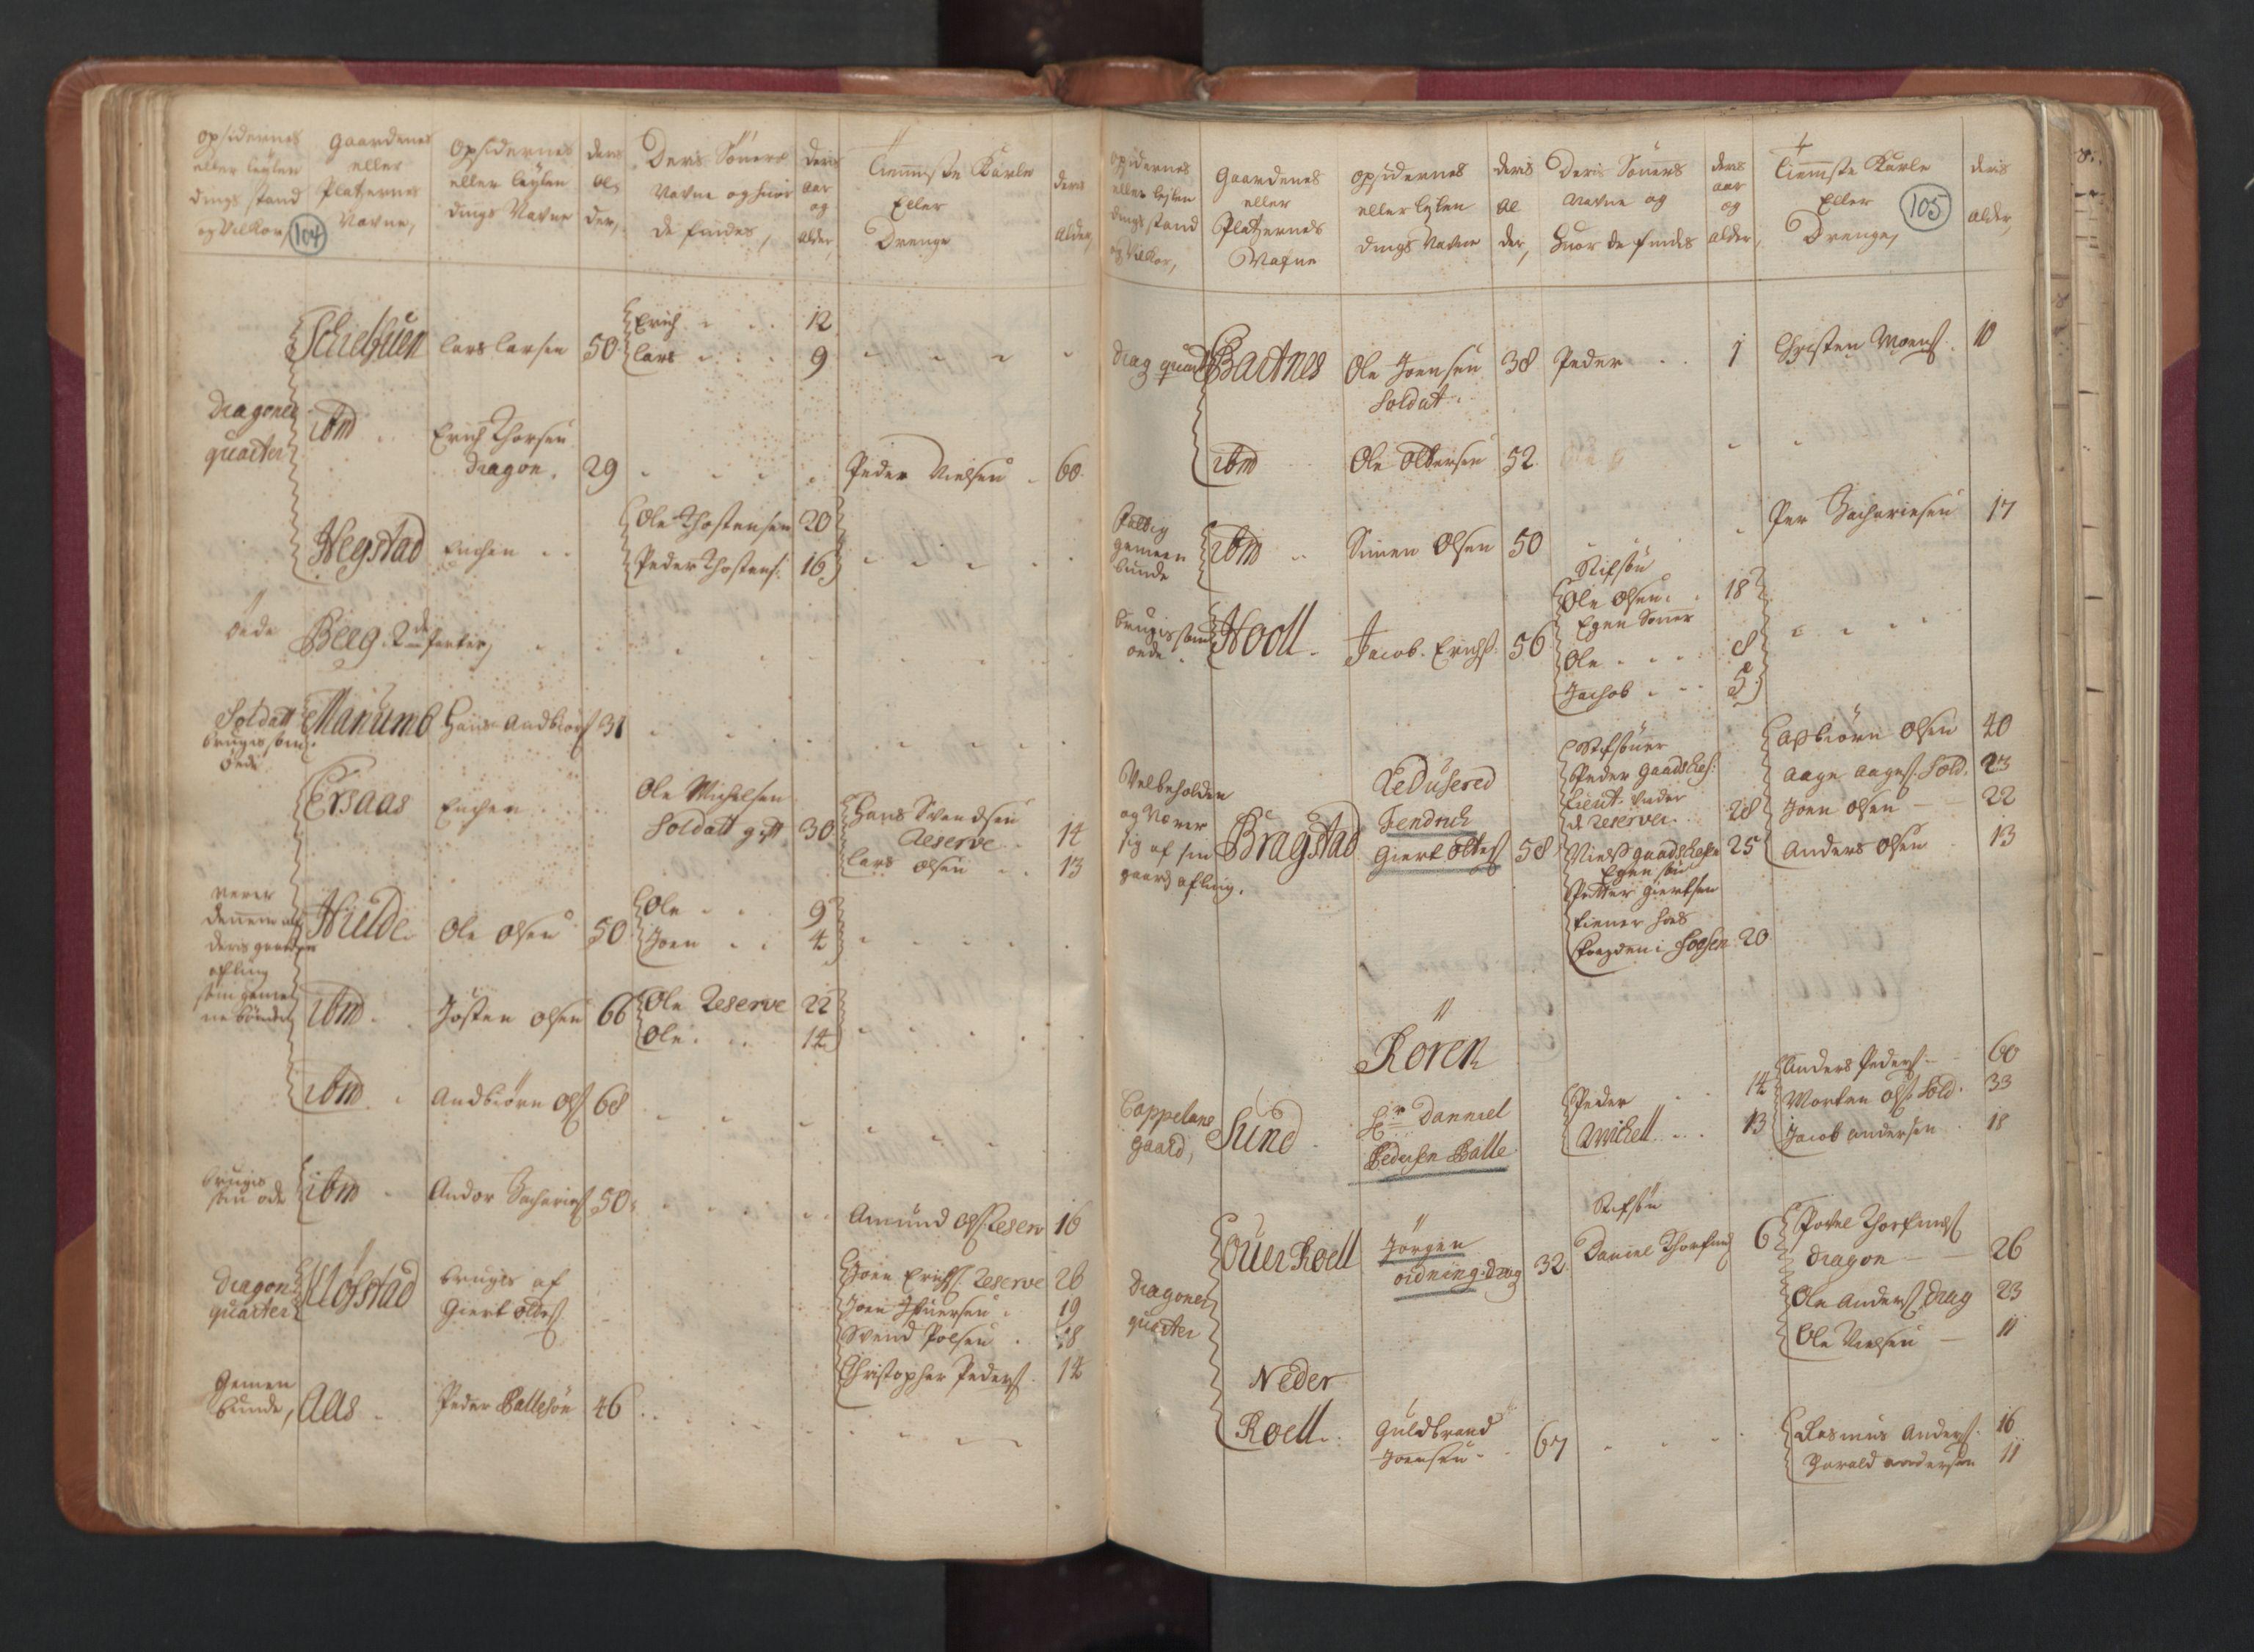 RA, Manntallet 1701, nr. 15: Inderøy fogderi og Namdal fogderi, 1701, s. 104-105